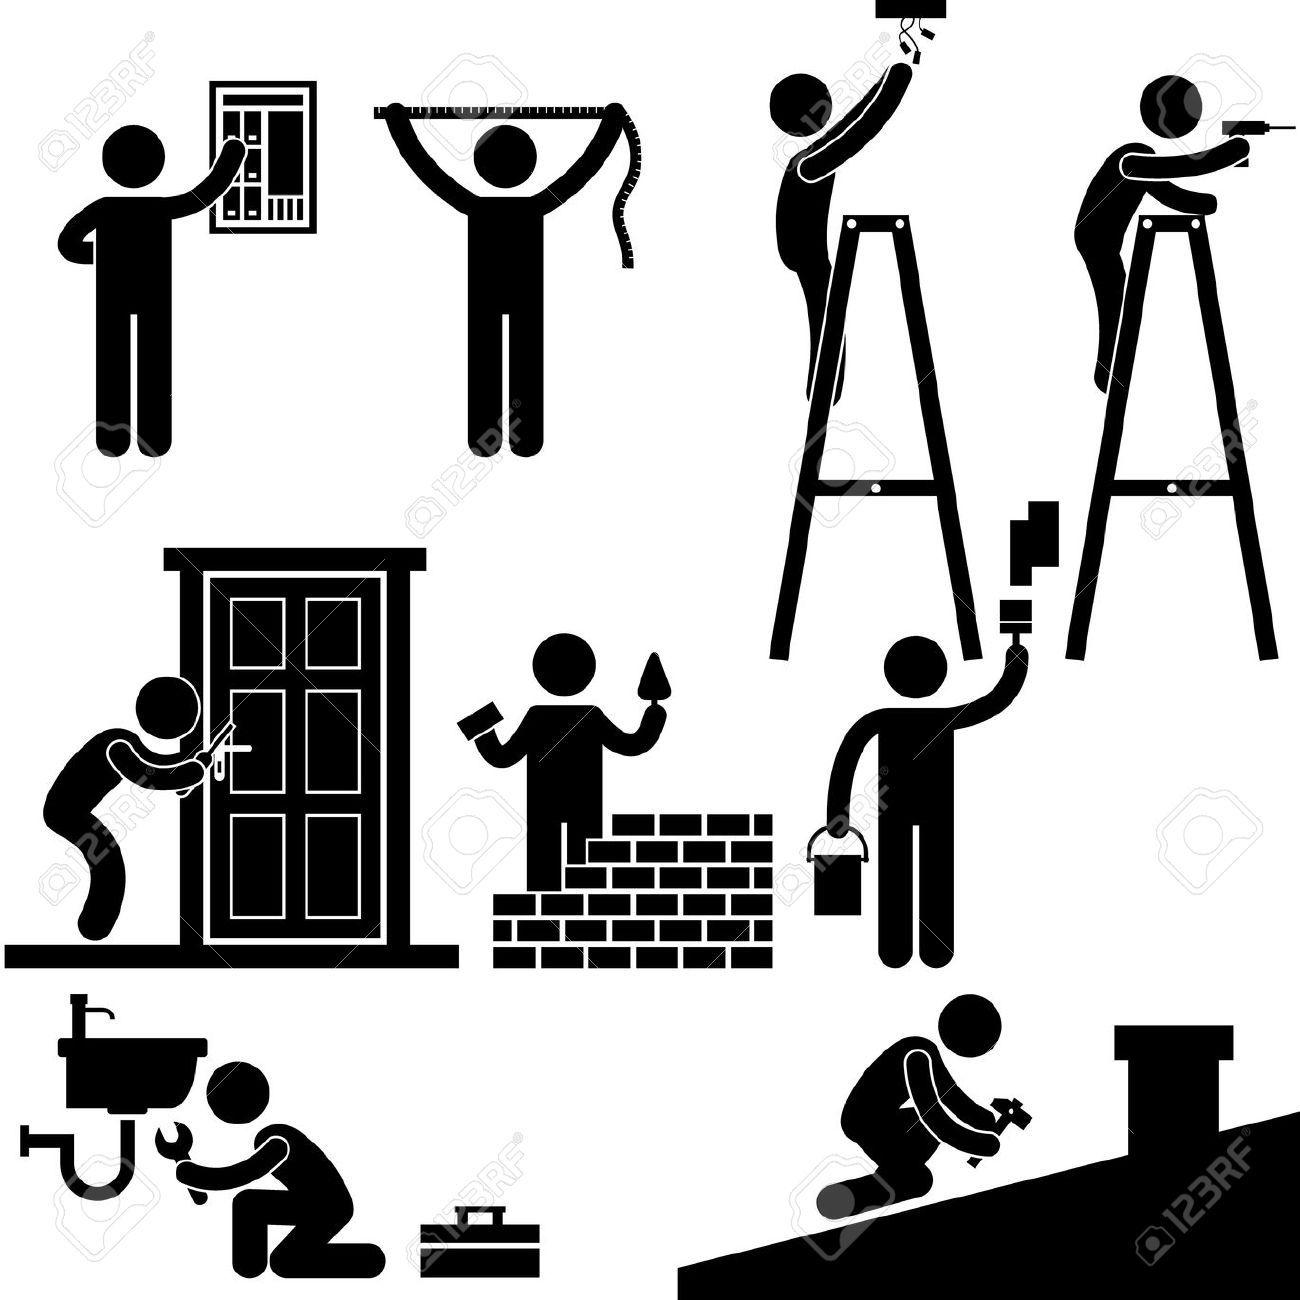 Stock Vector Electrician work, Home repair, Pictogram